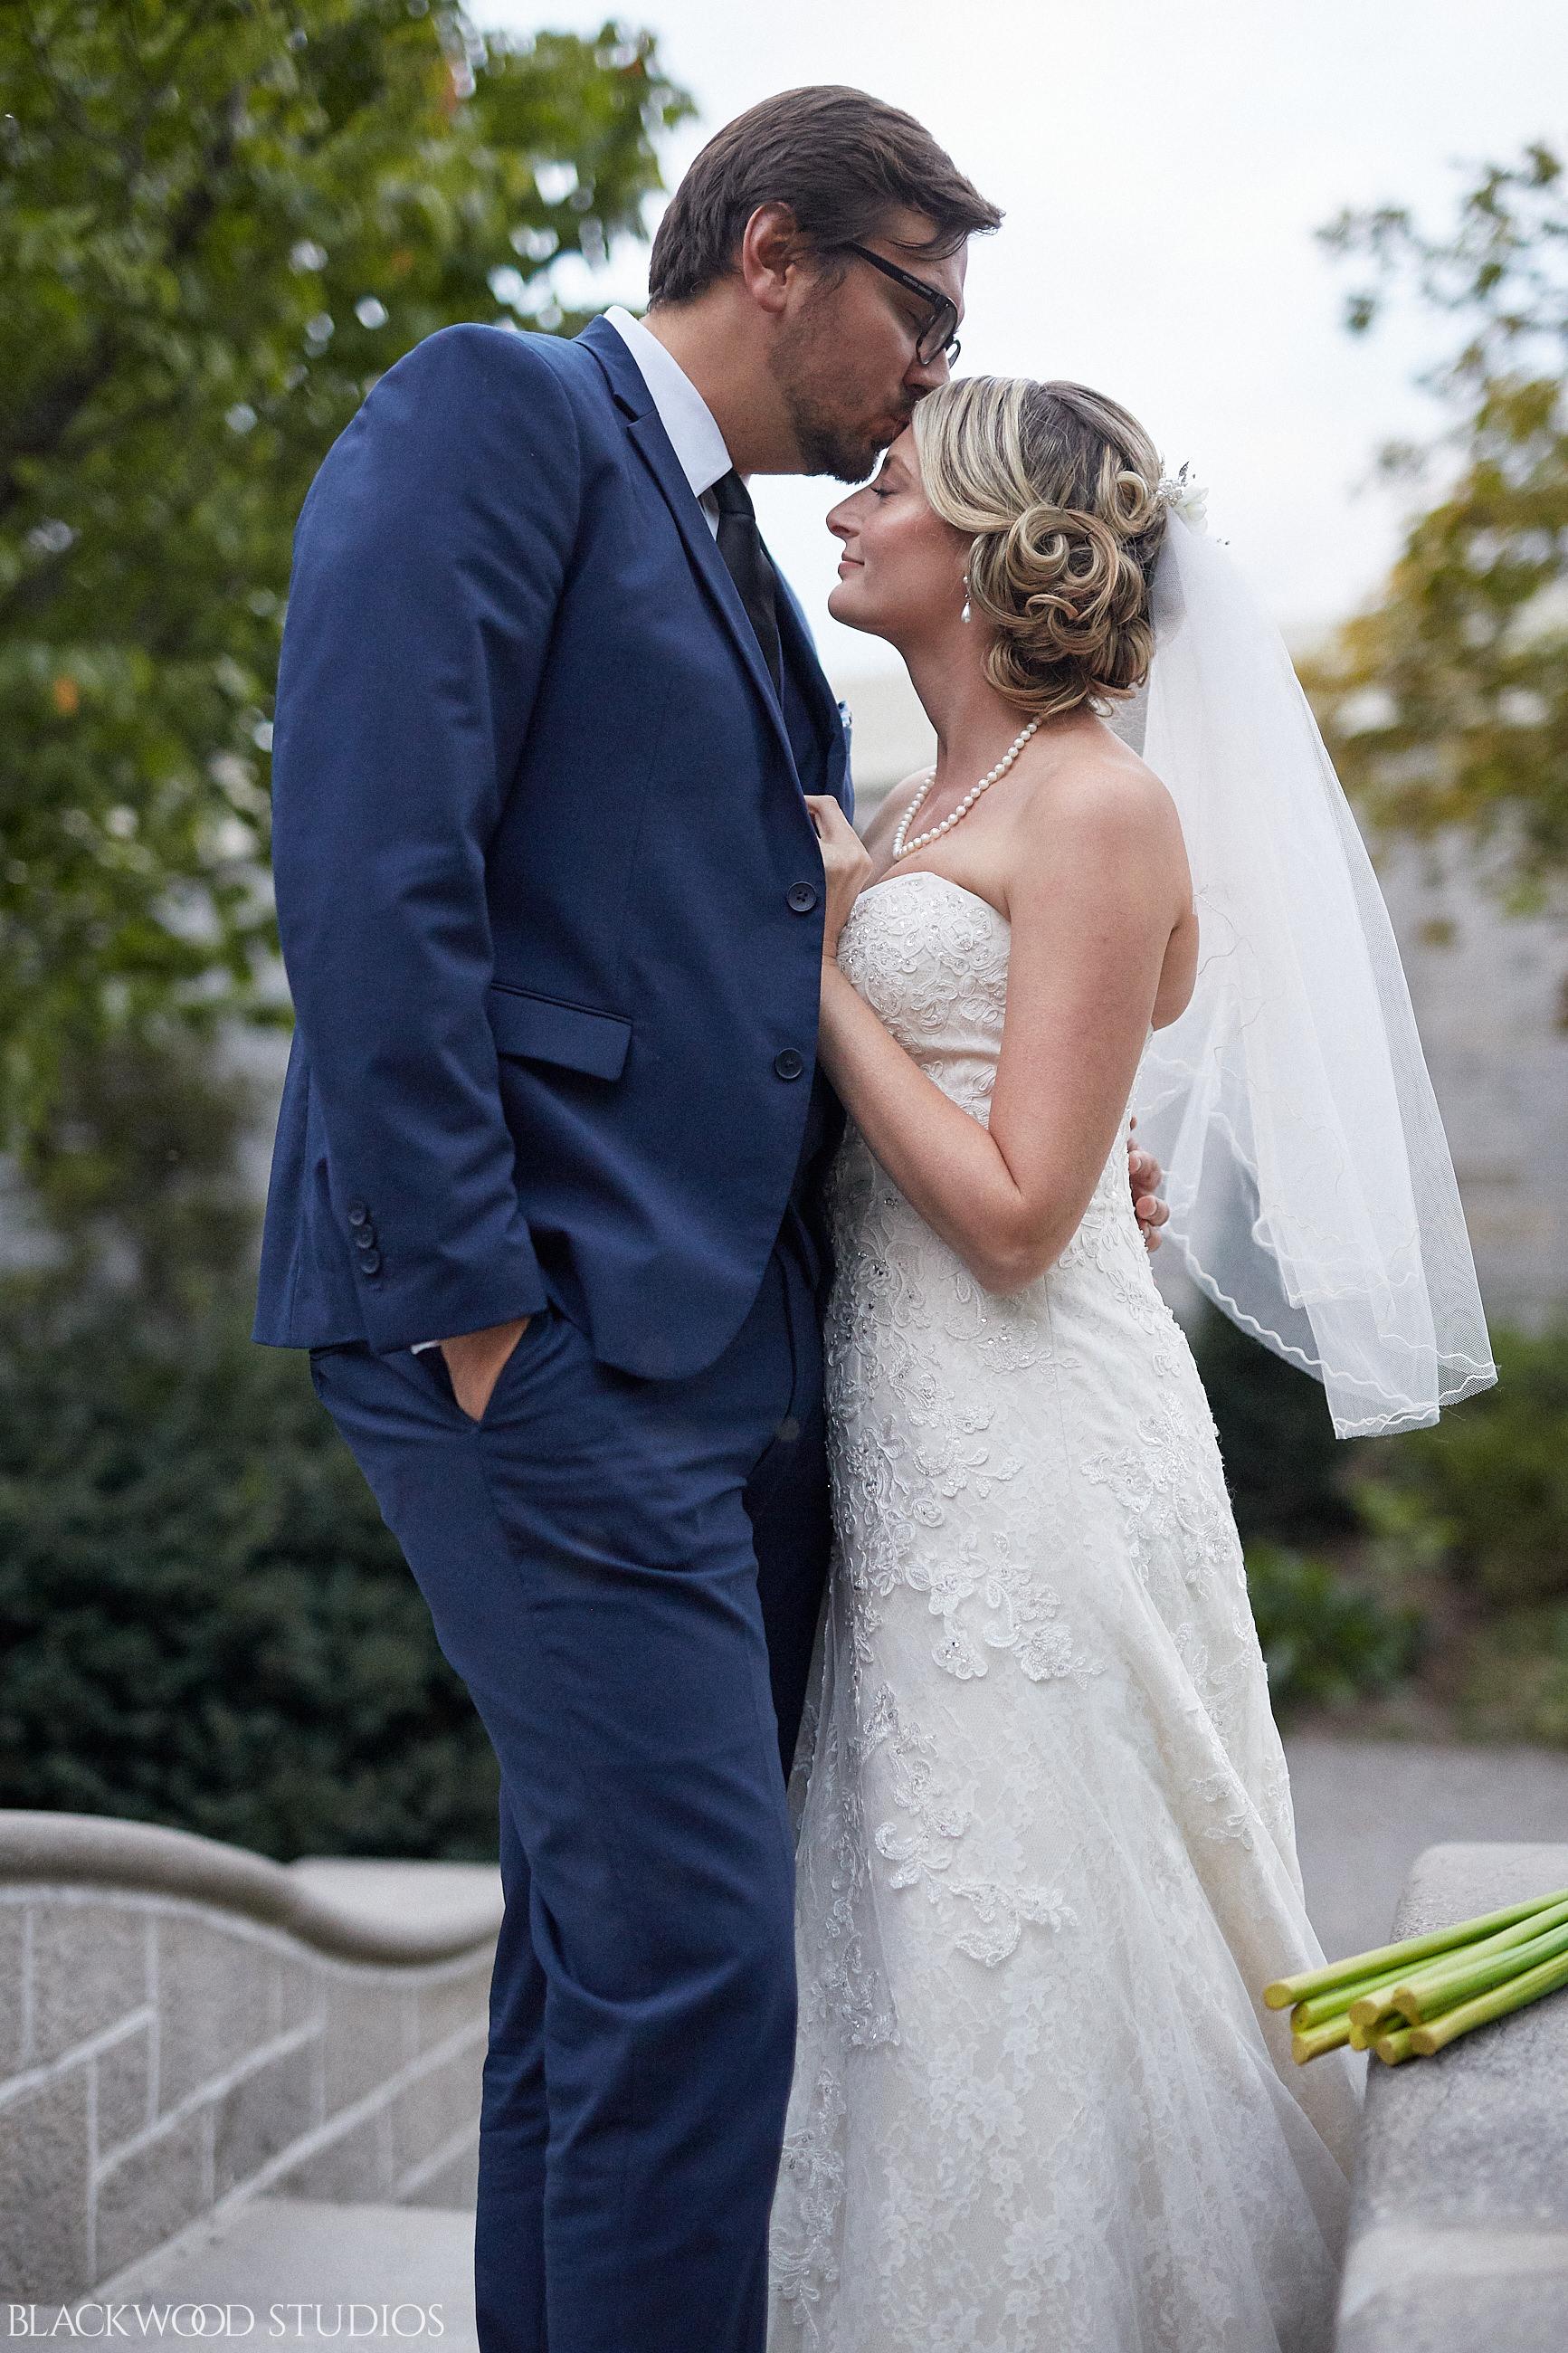 Blackwood-Studios-Wedding-Photography-20170928-184718-Marek-Katie-Michalek-Oakes-Garden-Theatre-Niagara-Falls-Ontario-Canada.jpg